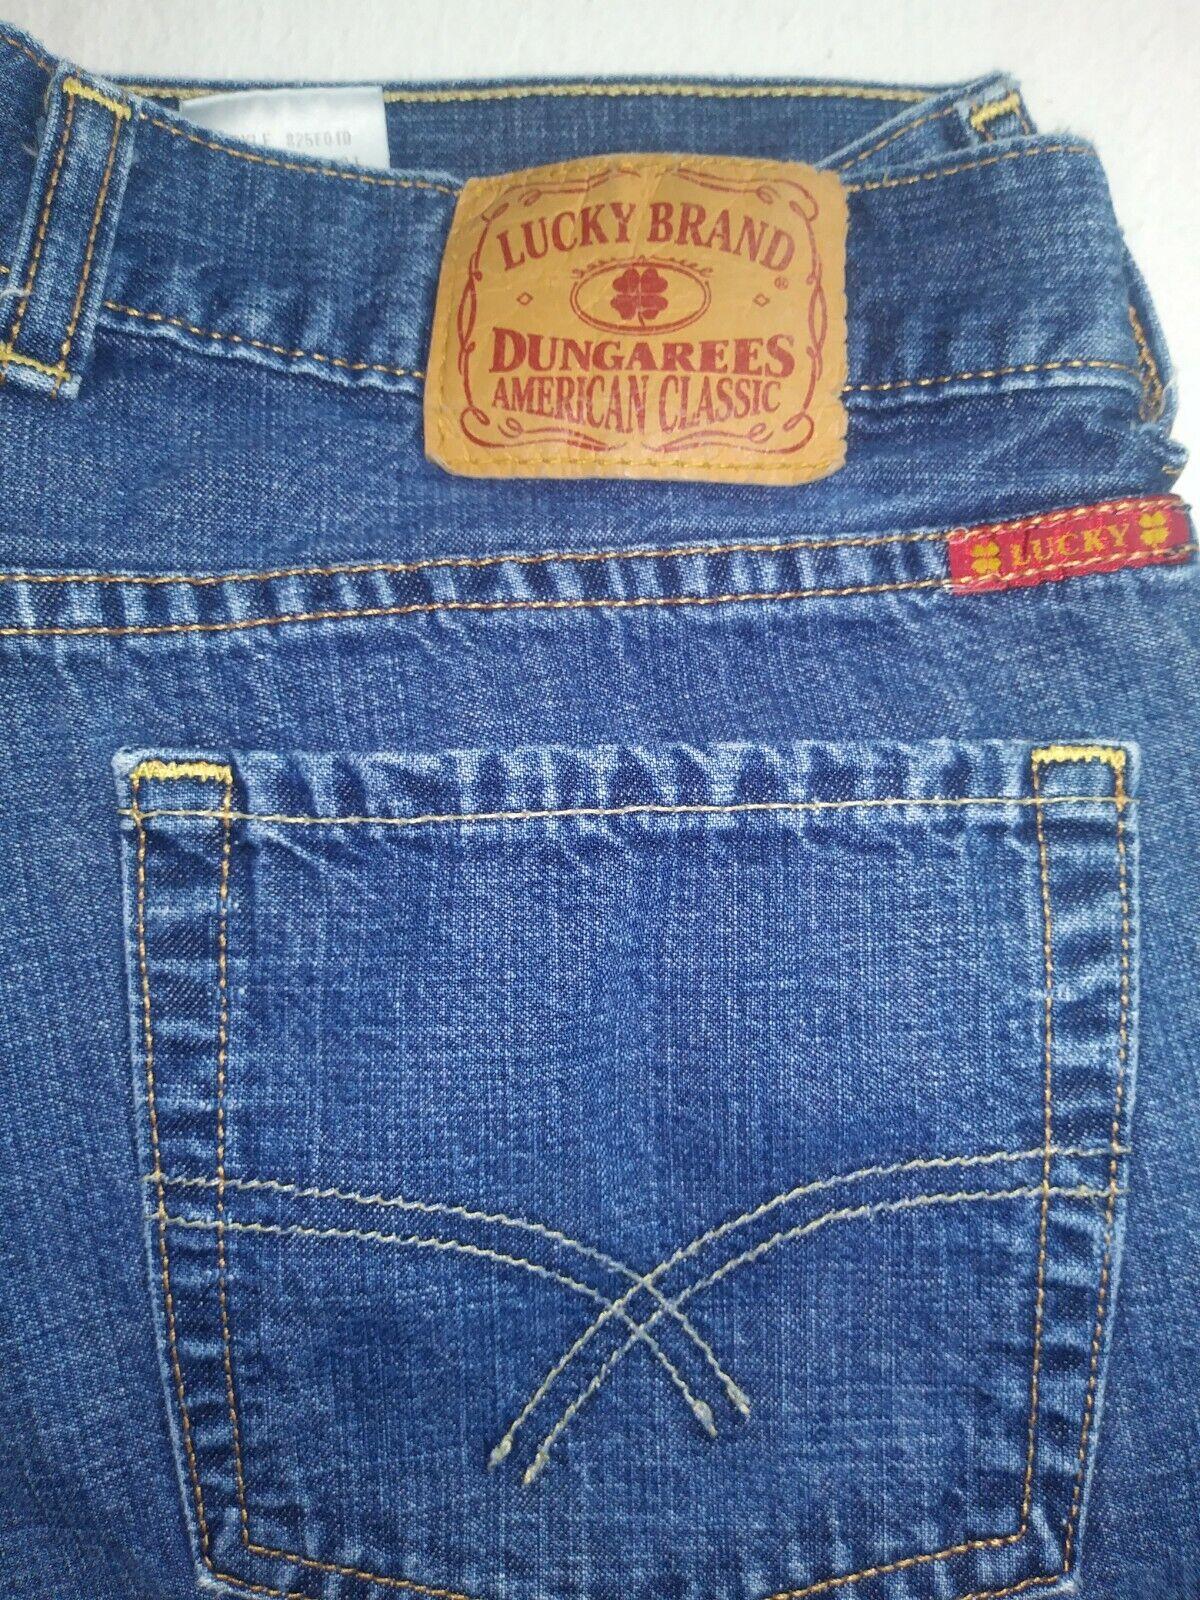 Women's Lucky Brand Dungarees Y2K Wide Leg Denim … - image 2